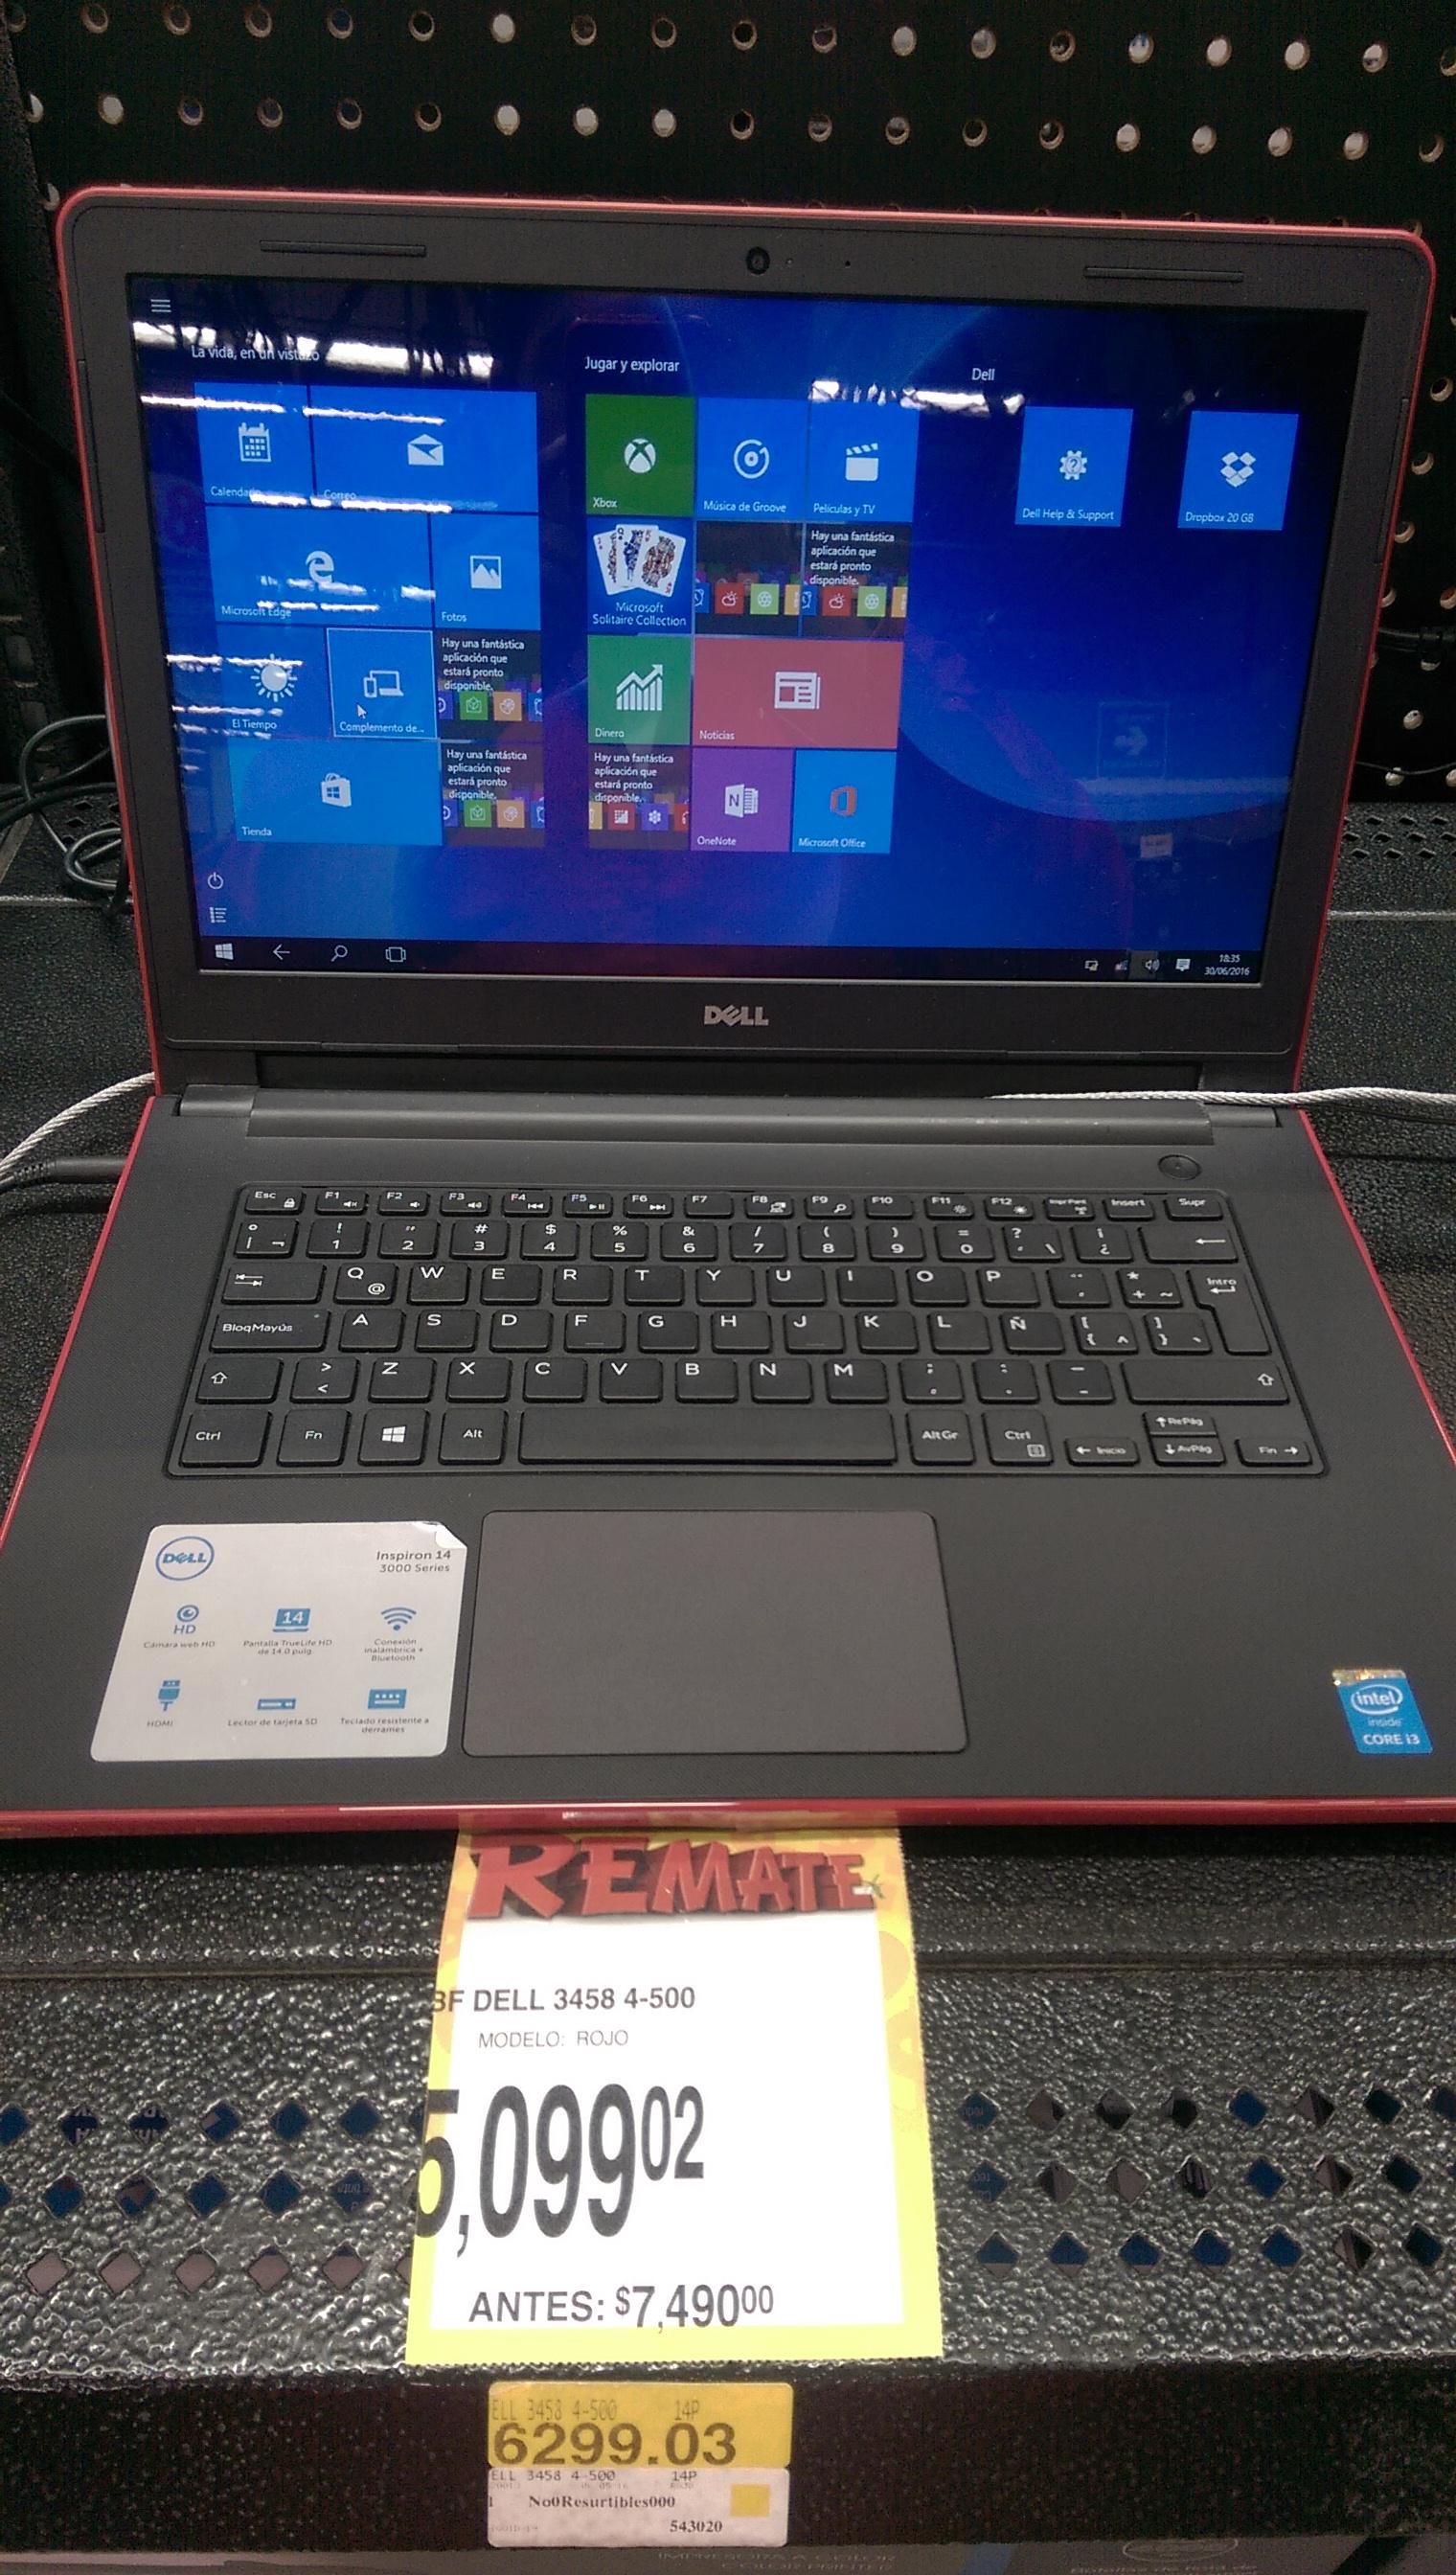 Bodega Aurrerá: laptop Dell con Core i3 a $5,099.02